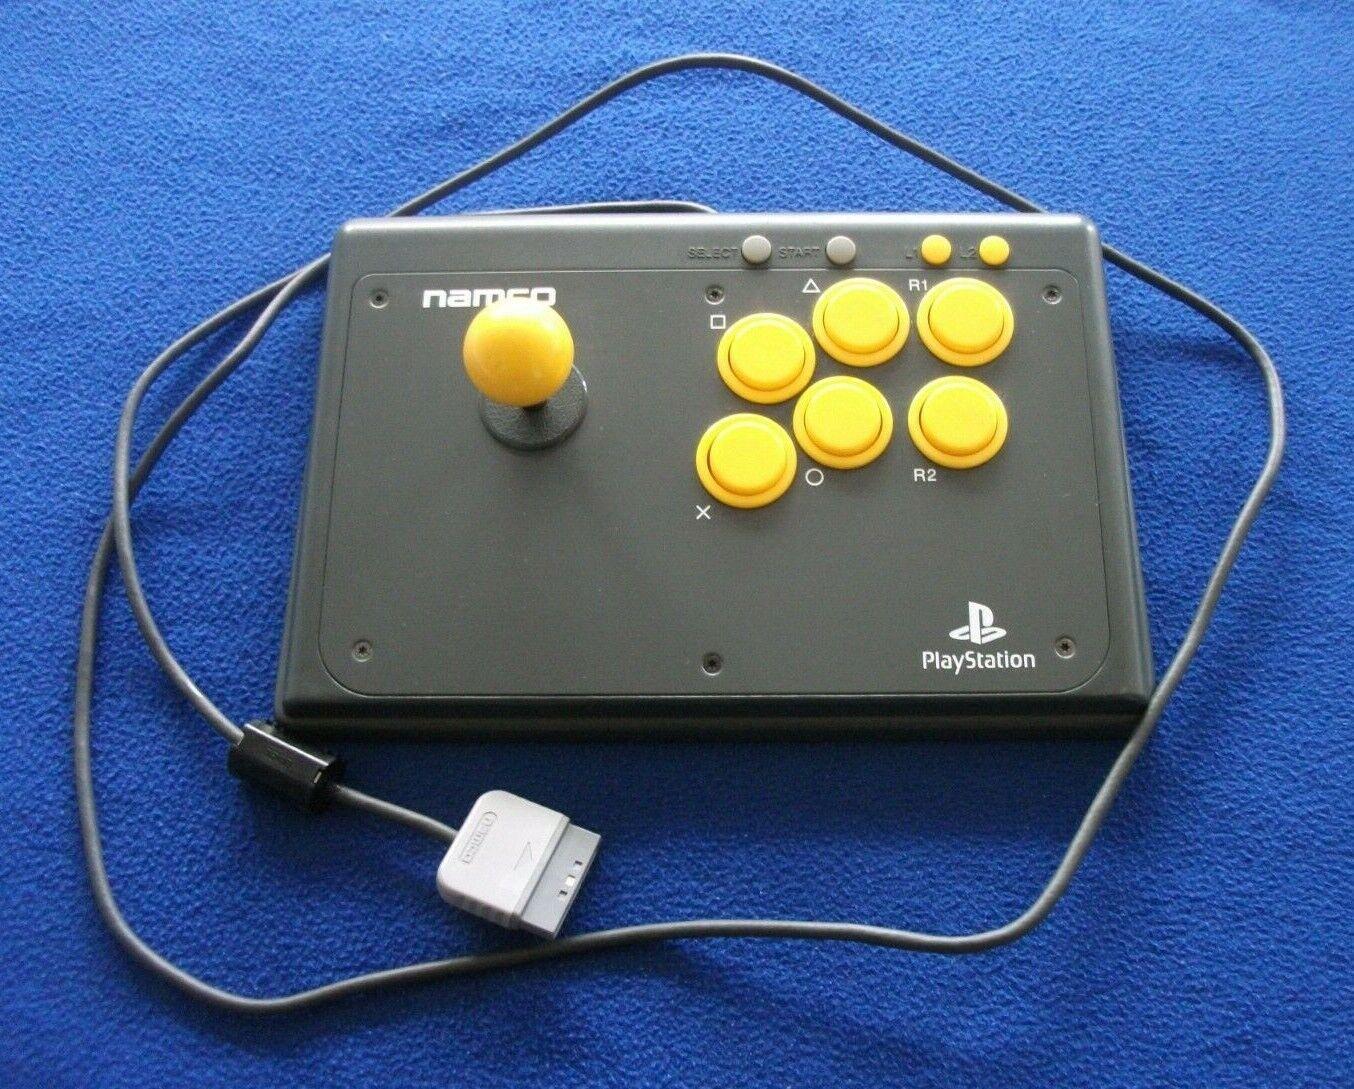 playstation-namco arcade stick-NPC 102-1996-rare-free uk p&p.